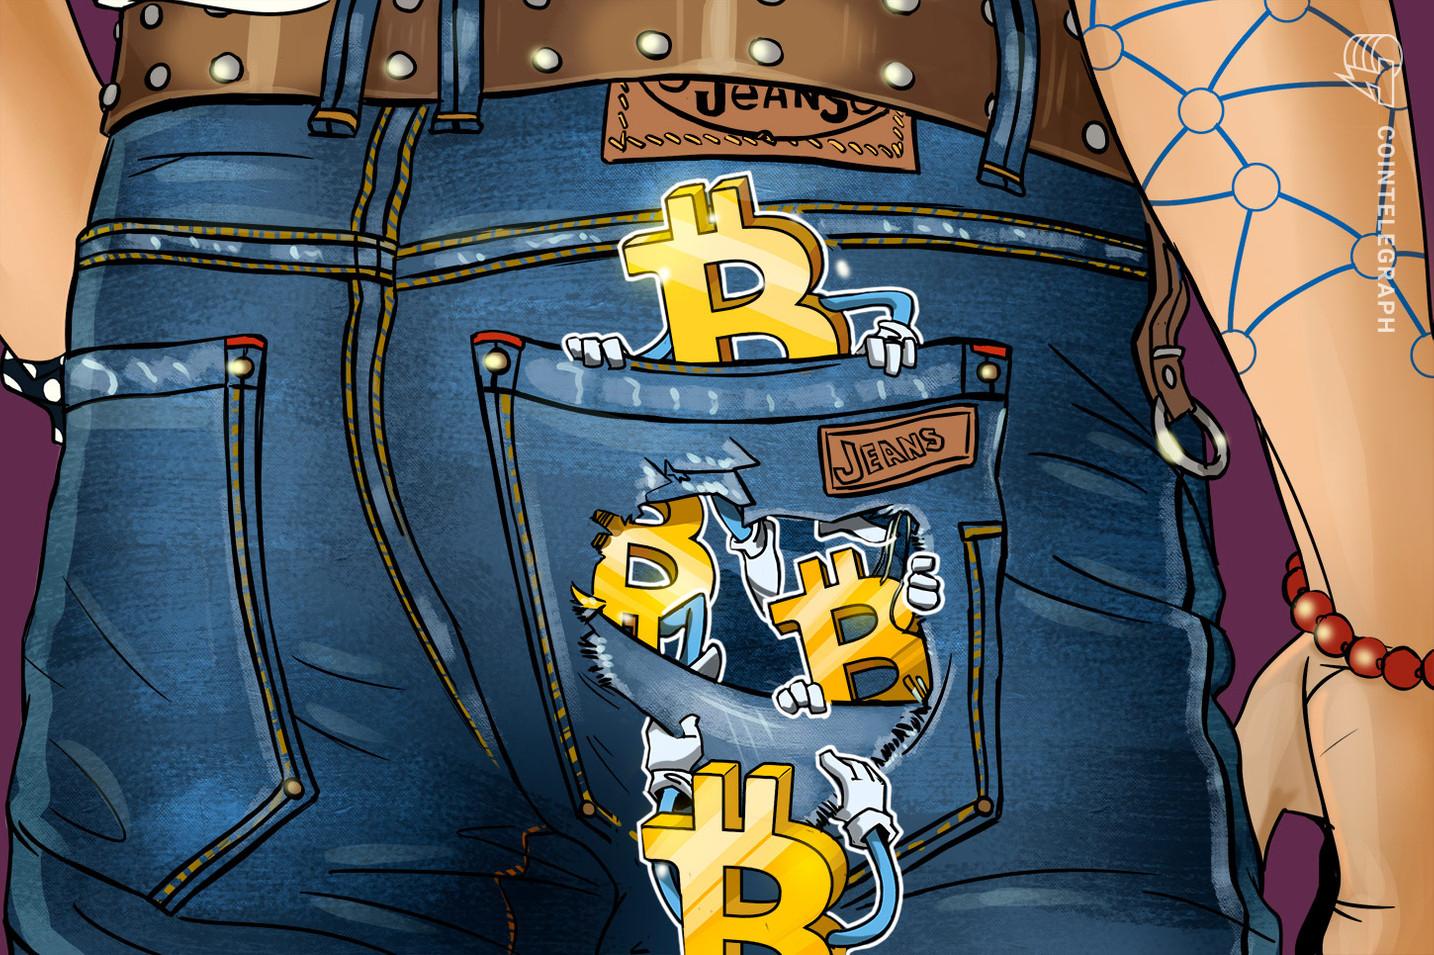 Los usuarios de QuadrigaCX solicitan detalles sobre cómo EY perdió 103 Bitcoins